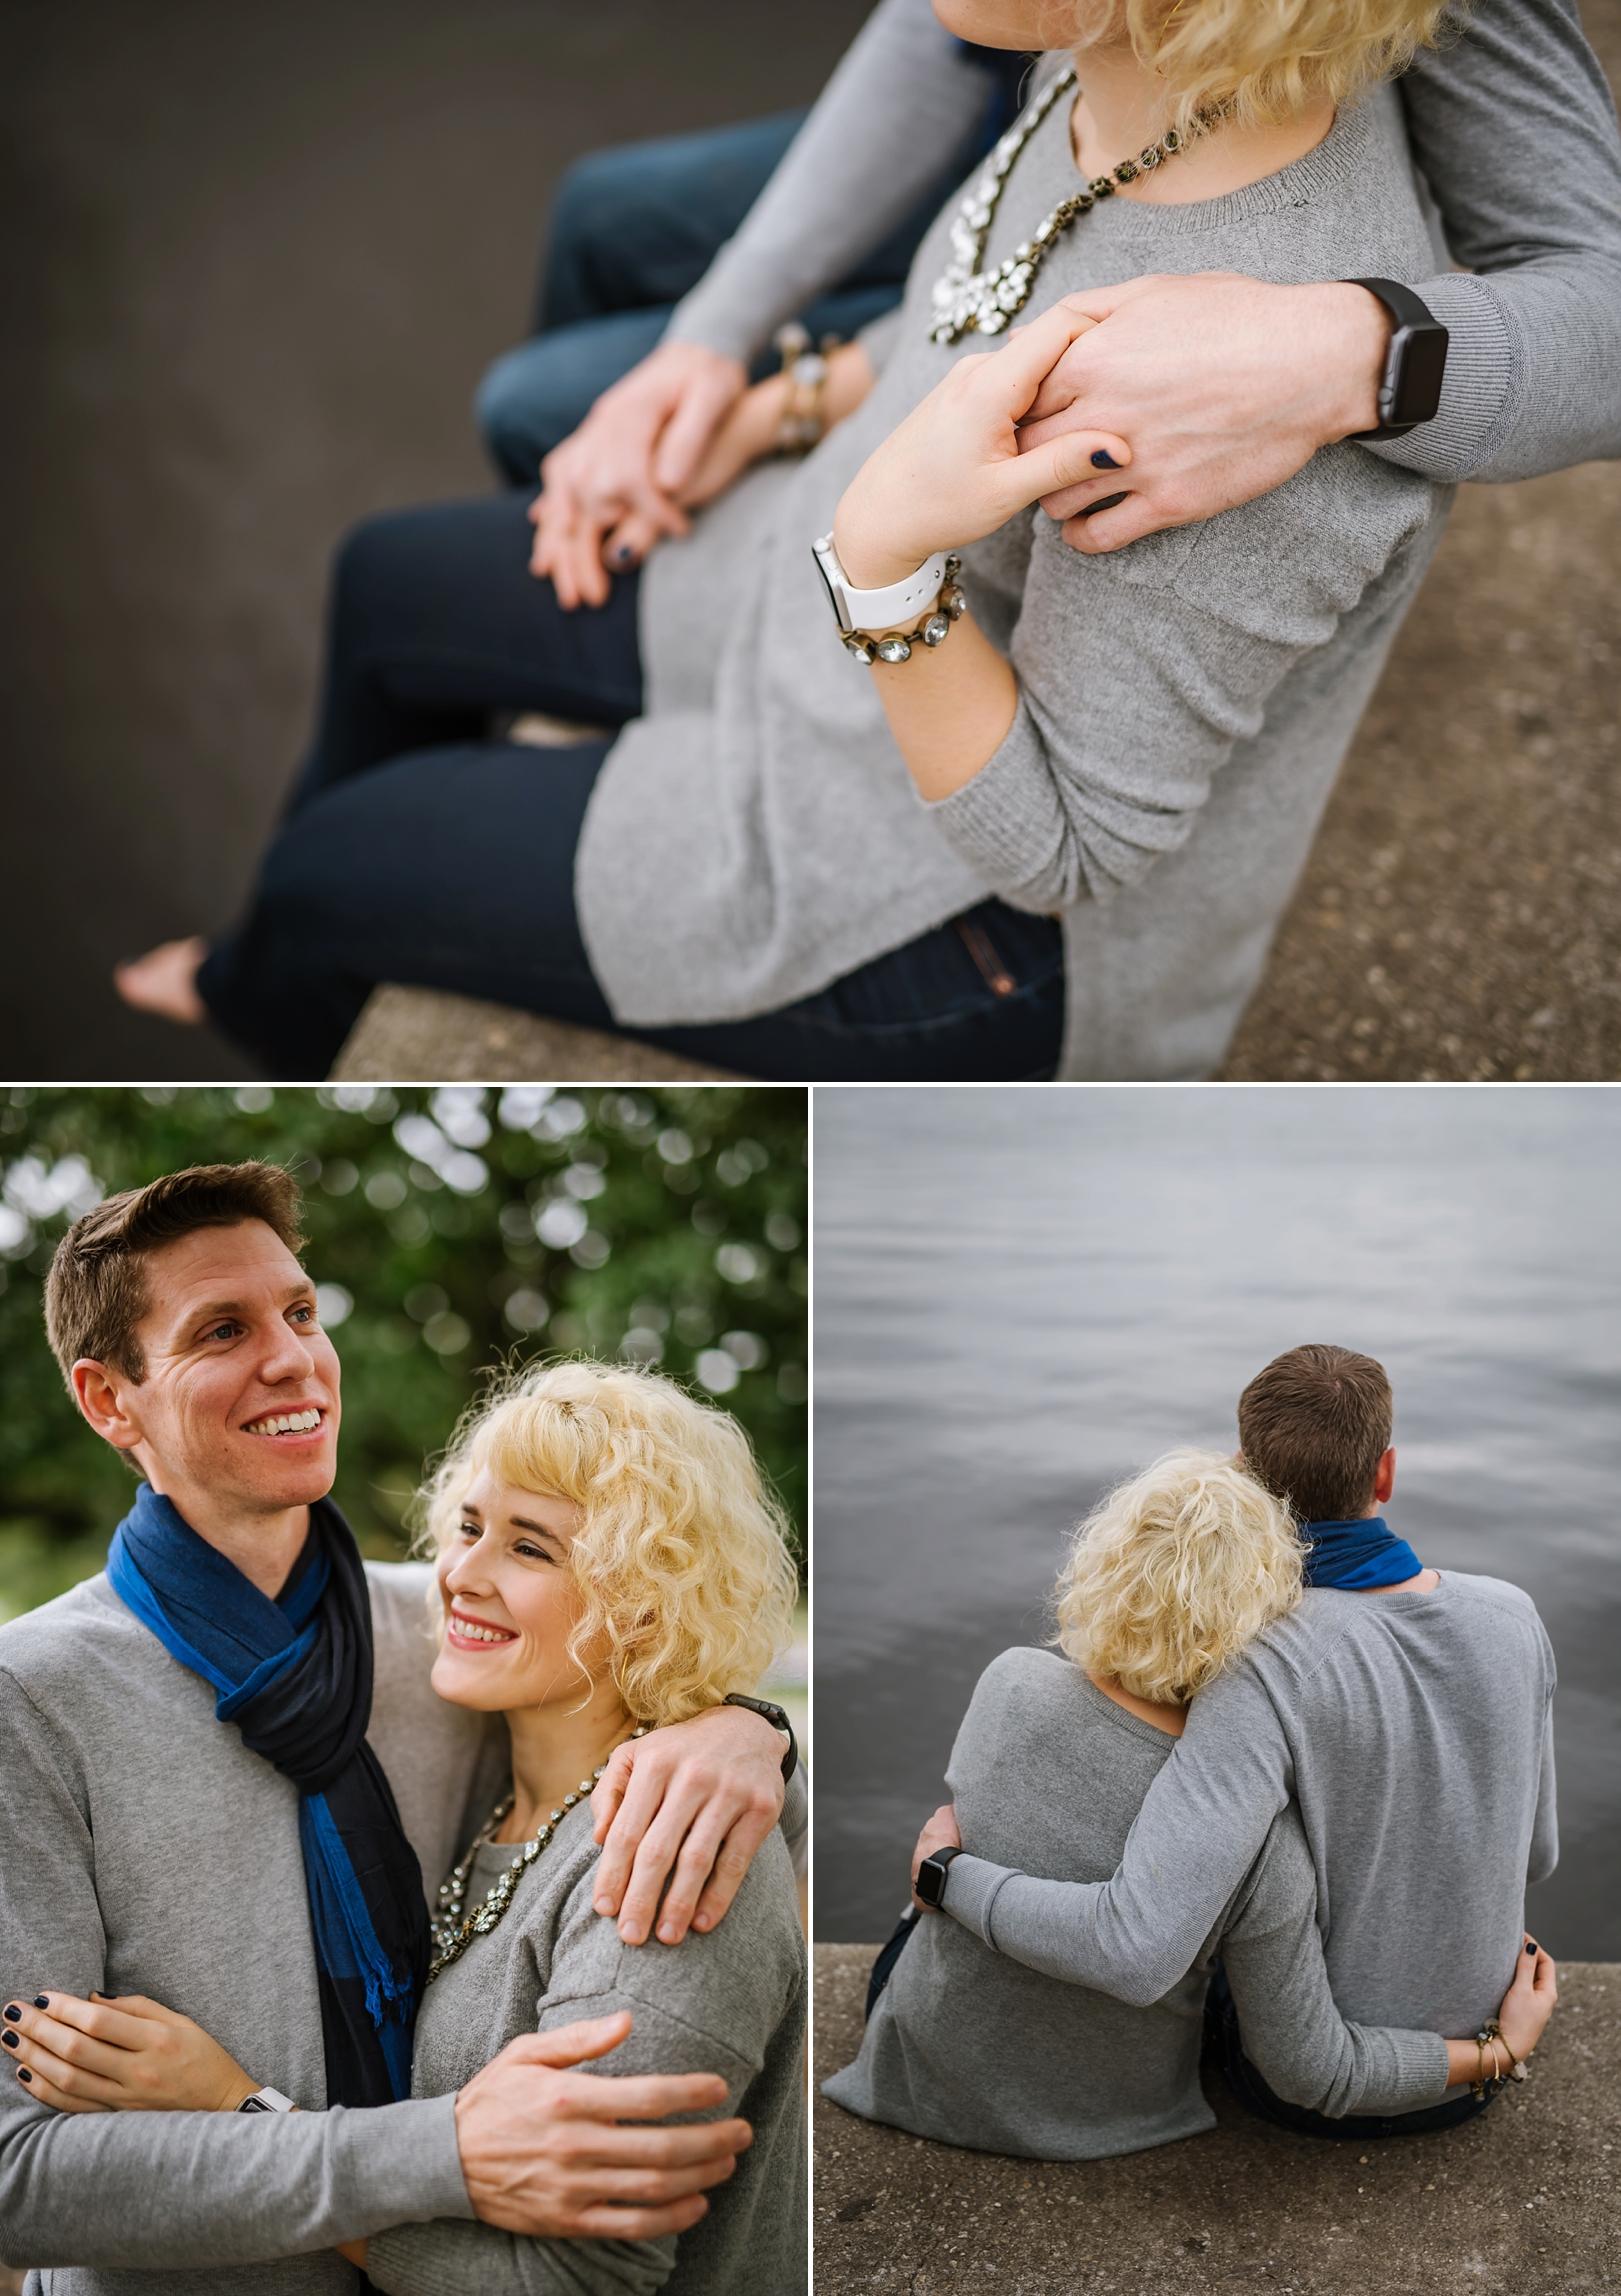 tampa-couple-photography-anniversary-photos-ashlee-hamon_0005.jpg